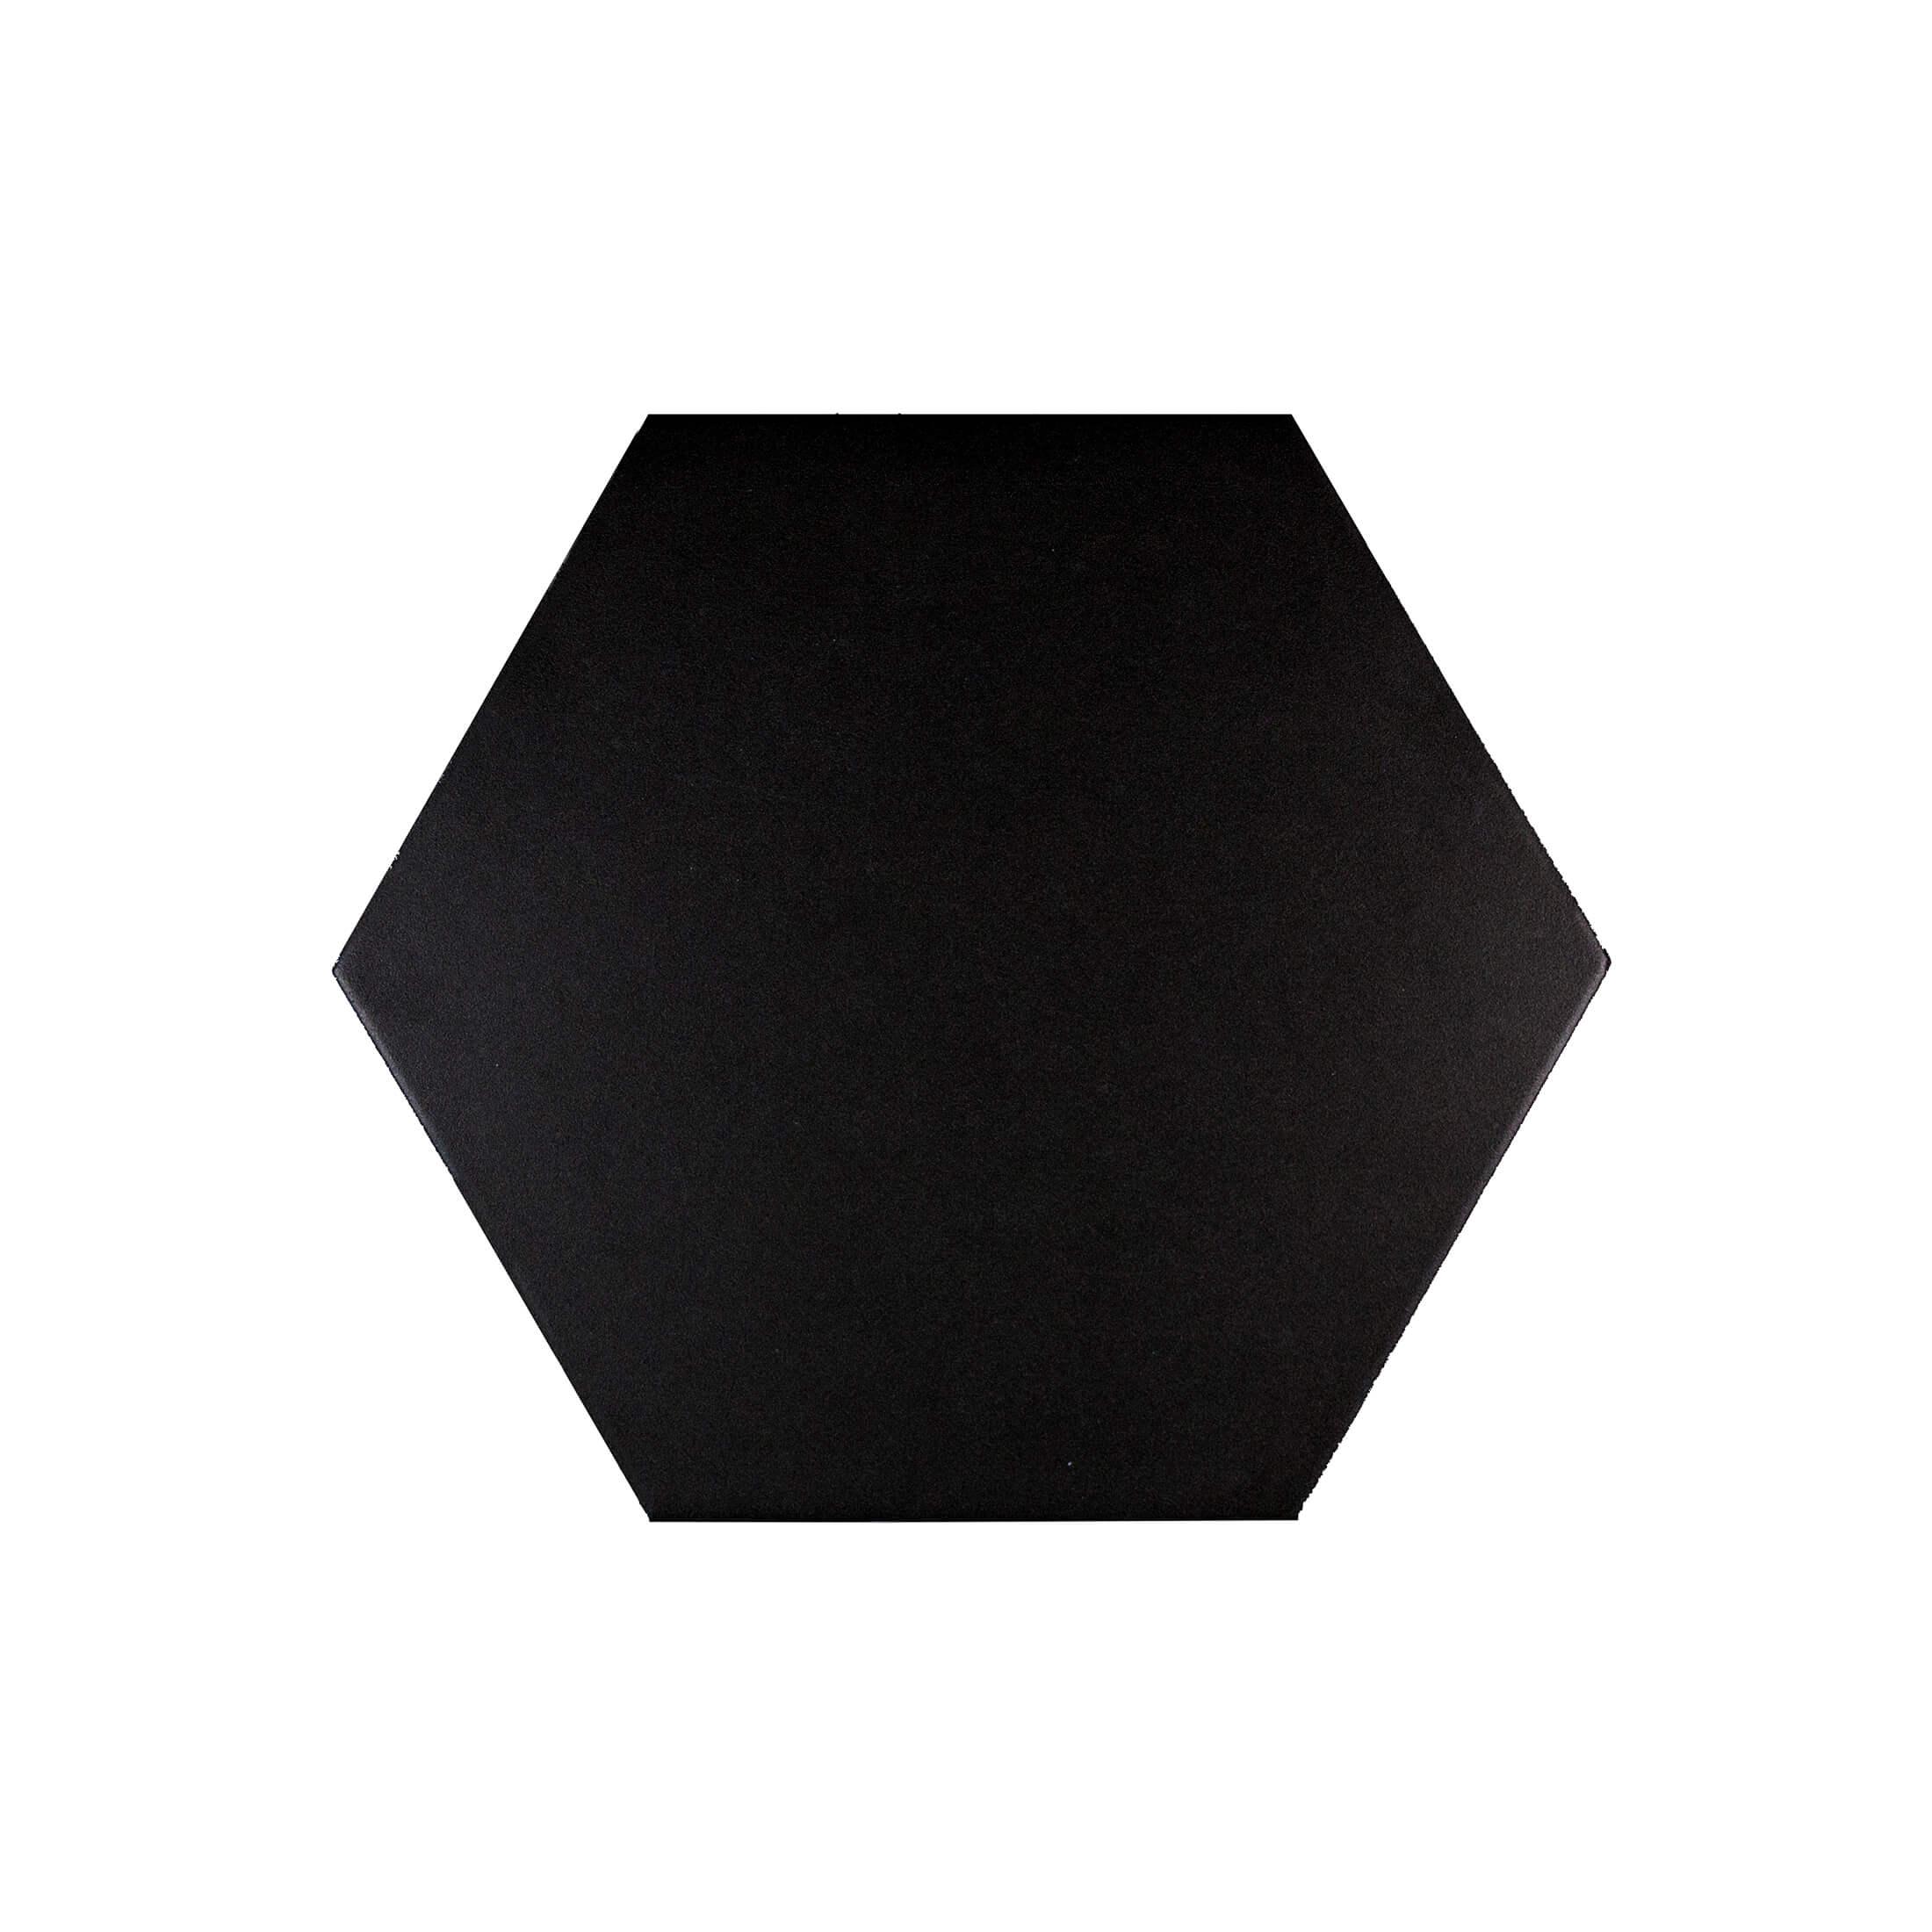 ADPV9015 - PAVIMENTO BLACK - 20 cm X 2,3 cm